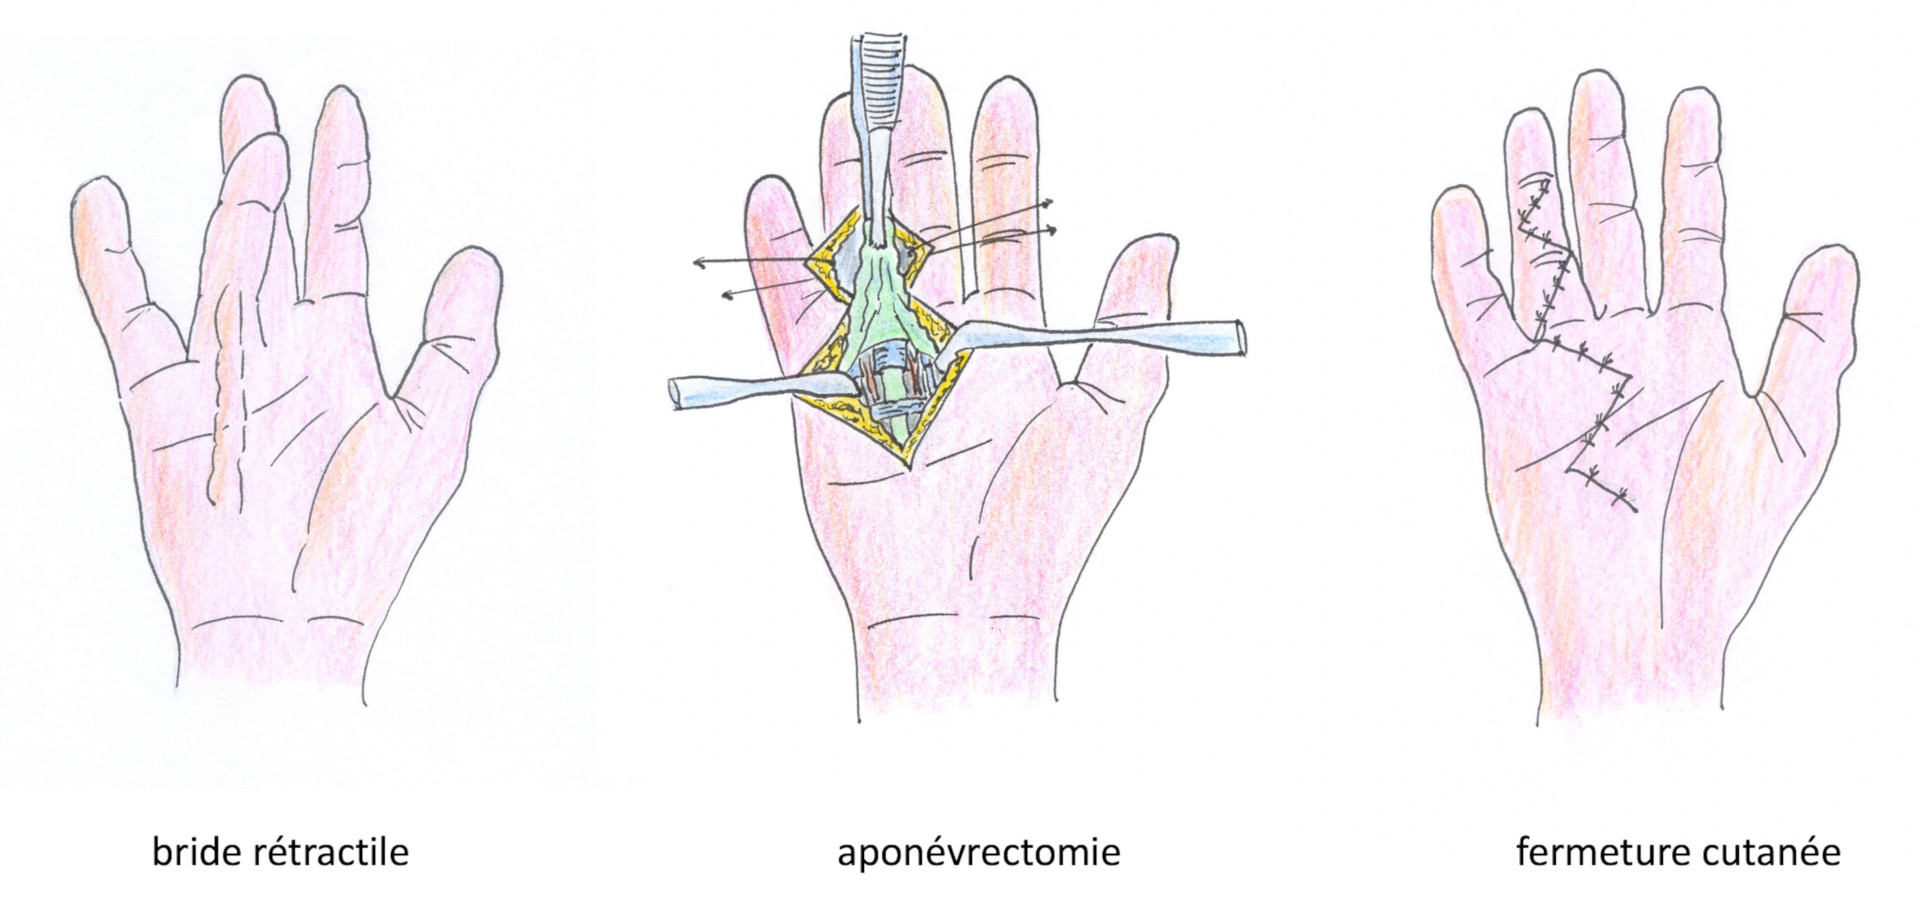 aponévrectomie simple